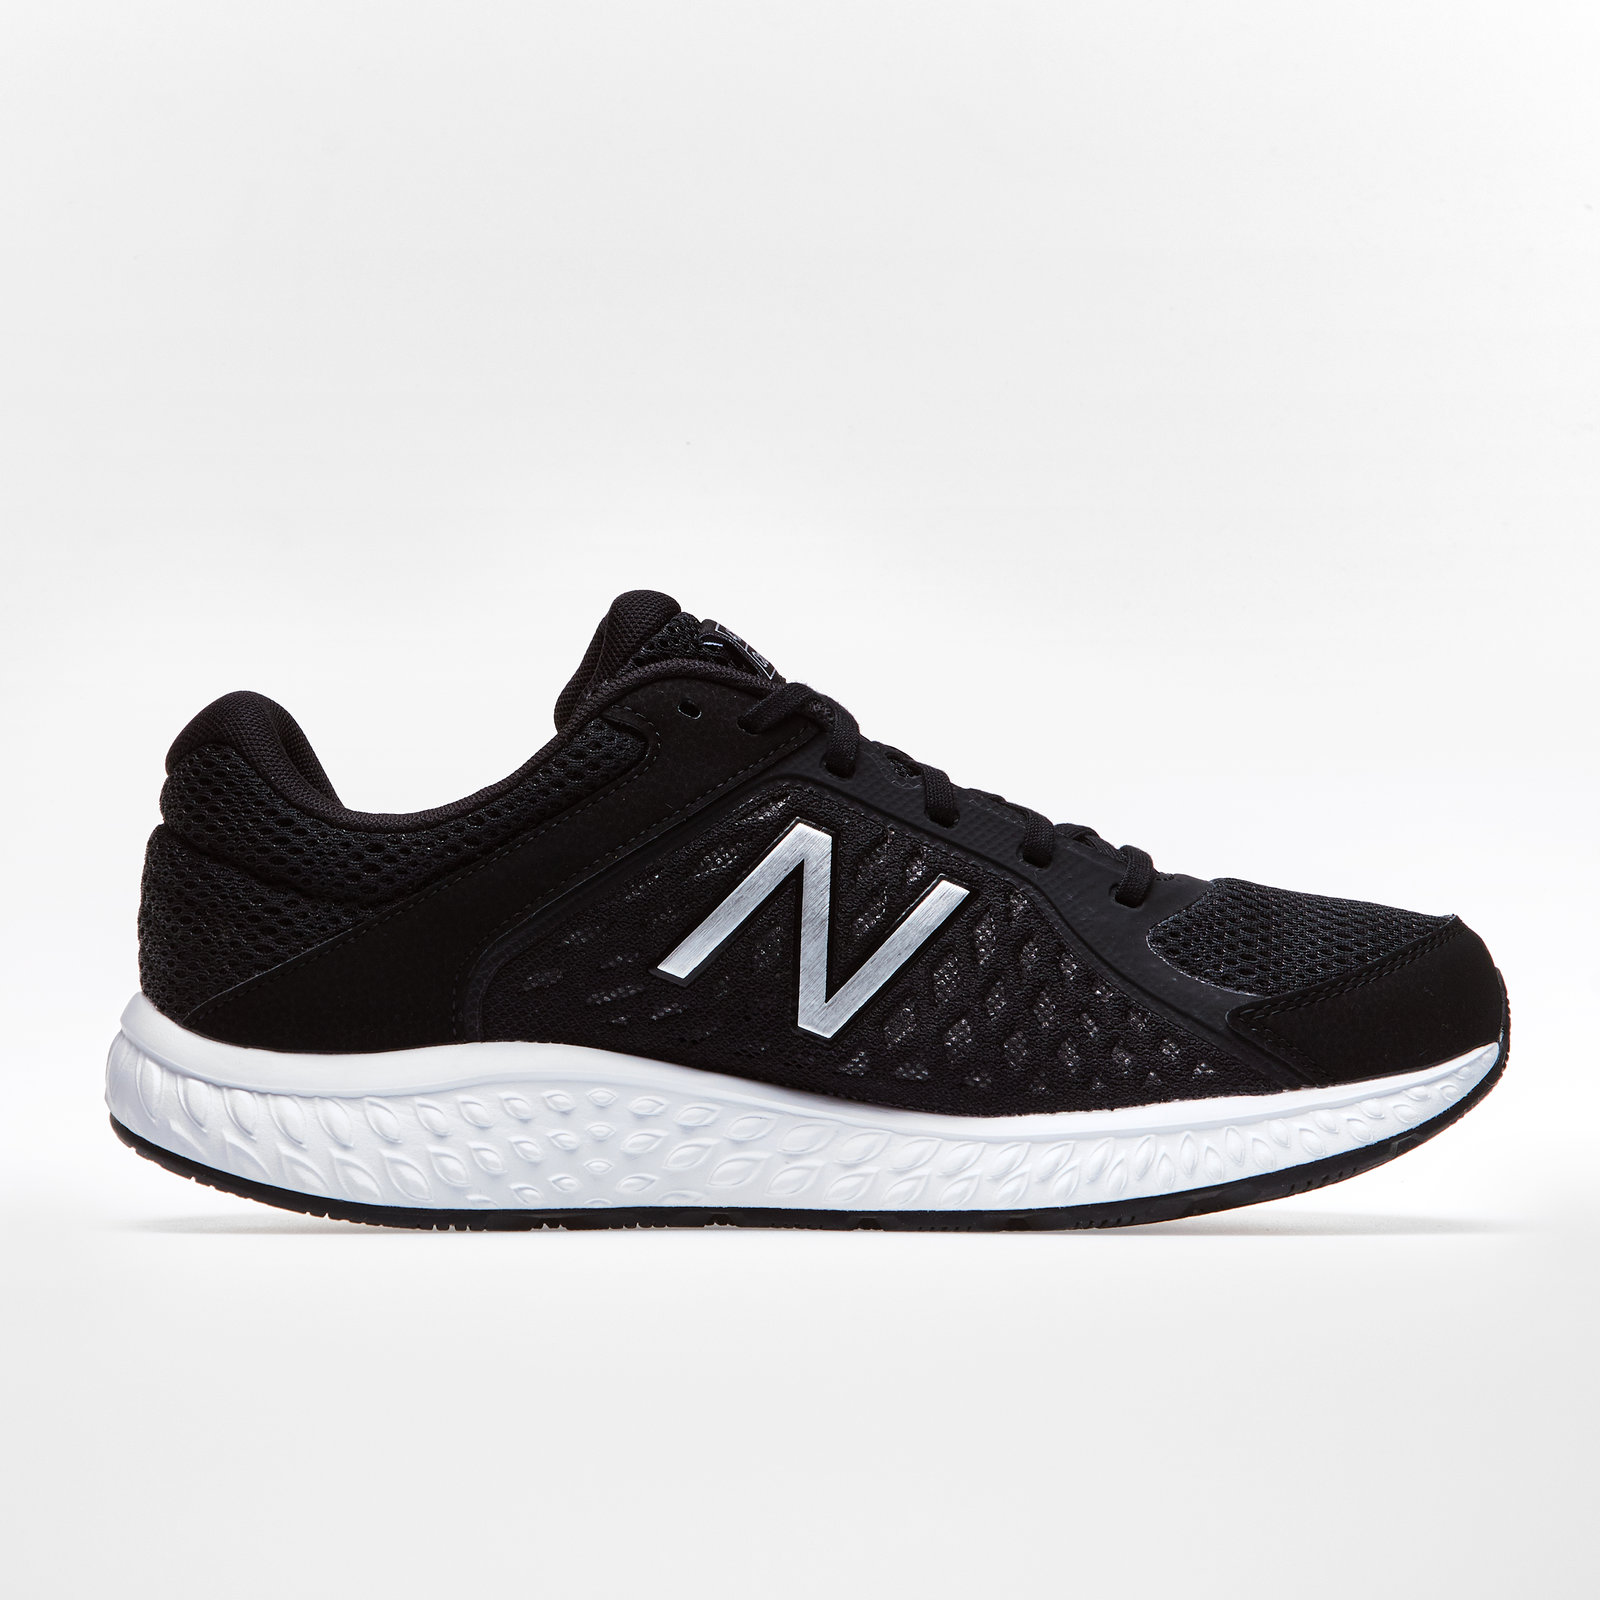 d351d50f93606 New Balance Mens 420 V4 Running Shoes Jogging Sports Trainers Black Footwear